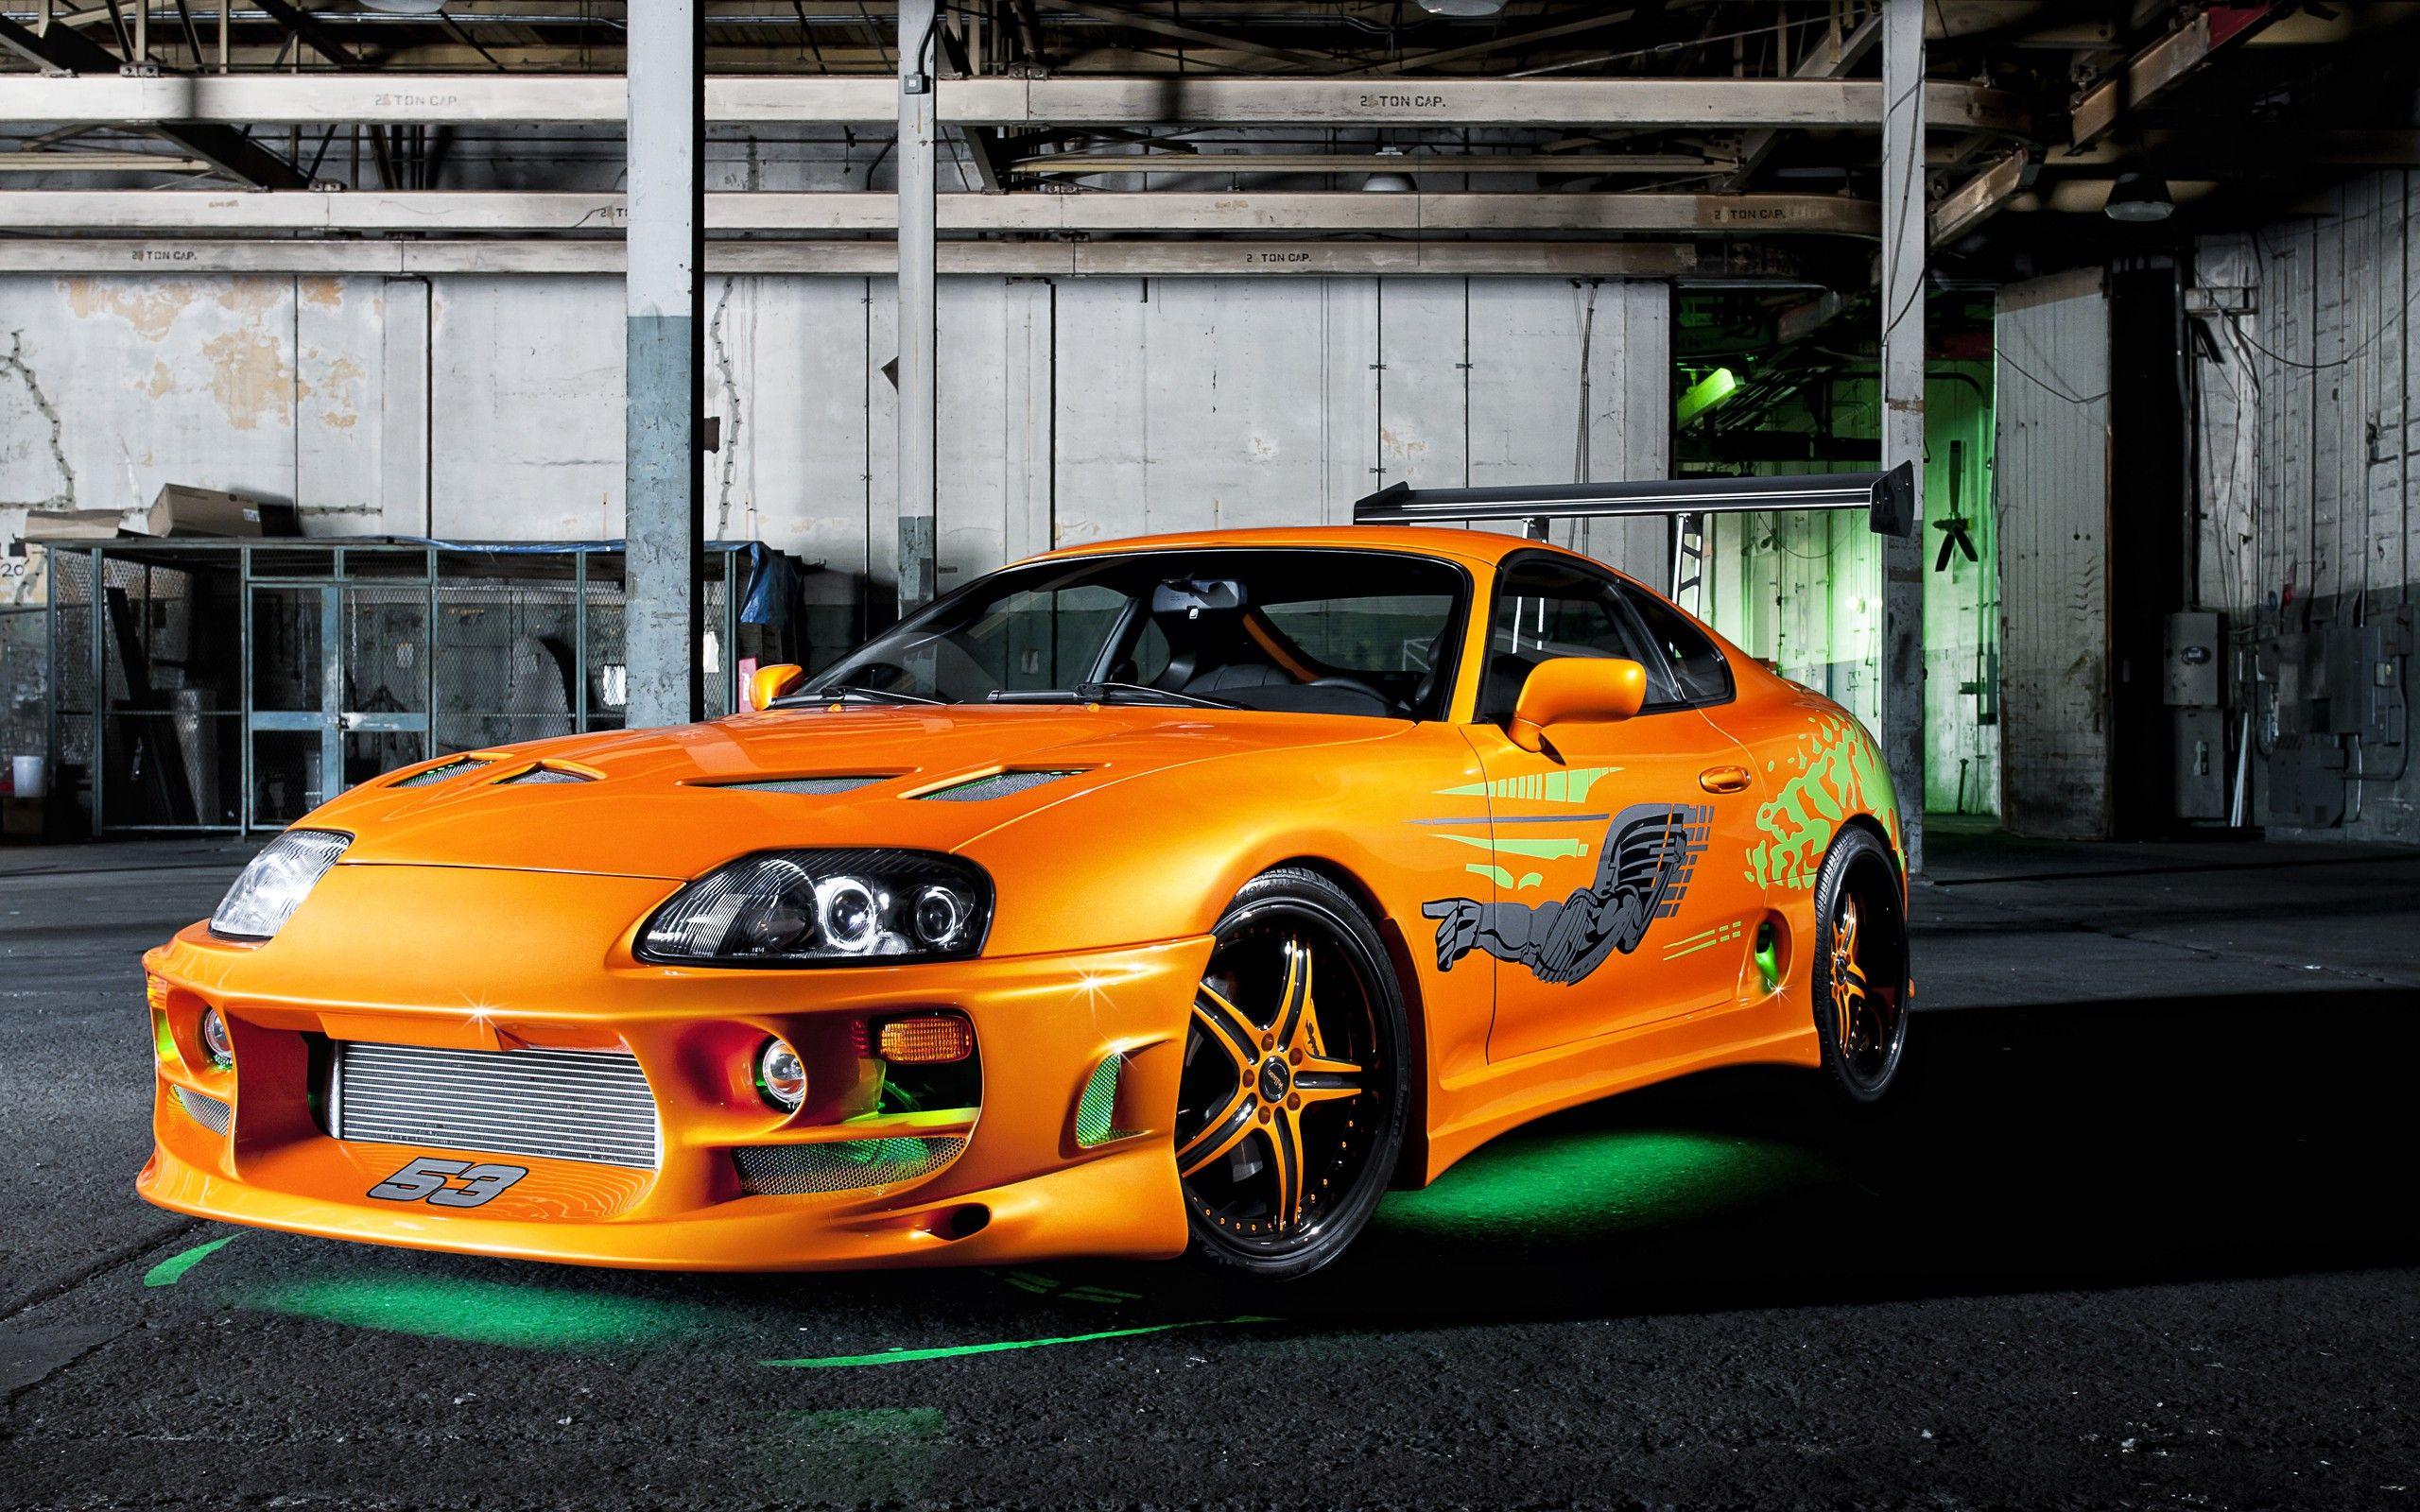 Toyota supra cars wallpapers hd